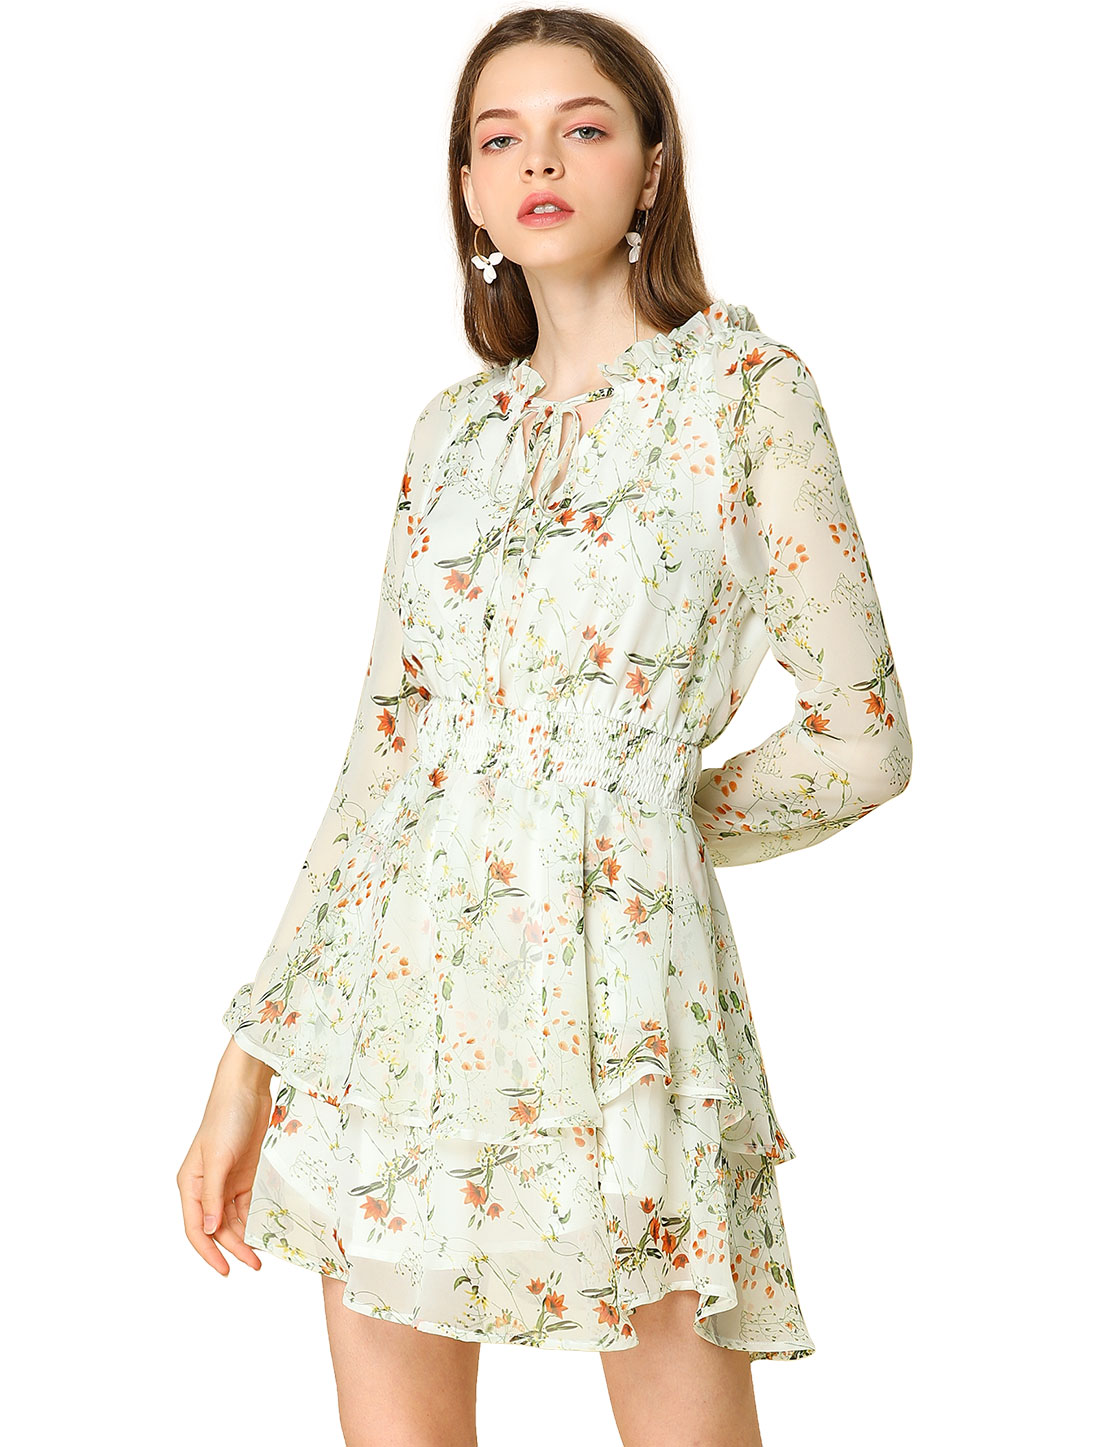 Allegra K Women's Floral Smocked Waist Chiffon Dress White XS